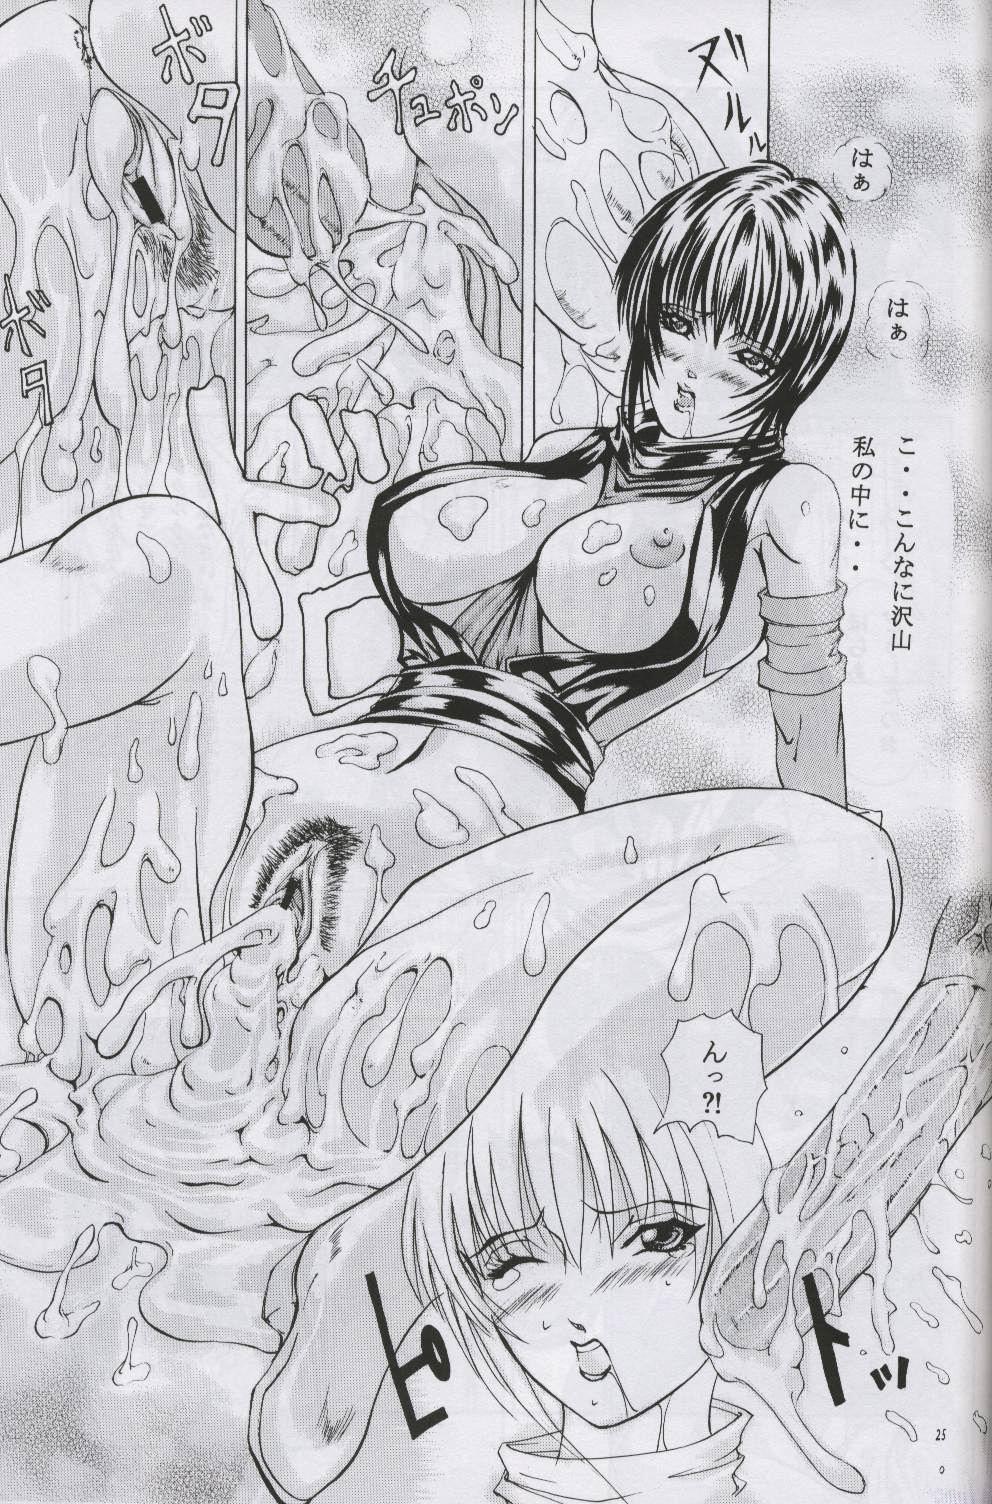 [LUCRETiA (Hiichan)] Ken-Jyuu Retouch Version - Le sexe dur avec l'animal. numero:03 (Samurai Spirits) 22